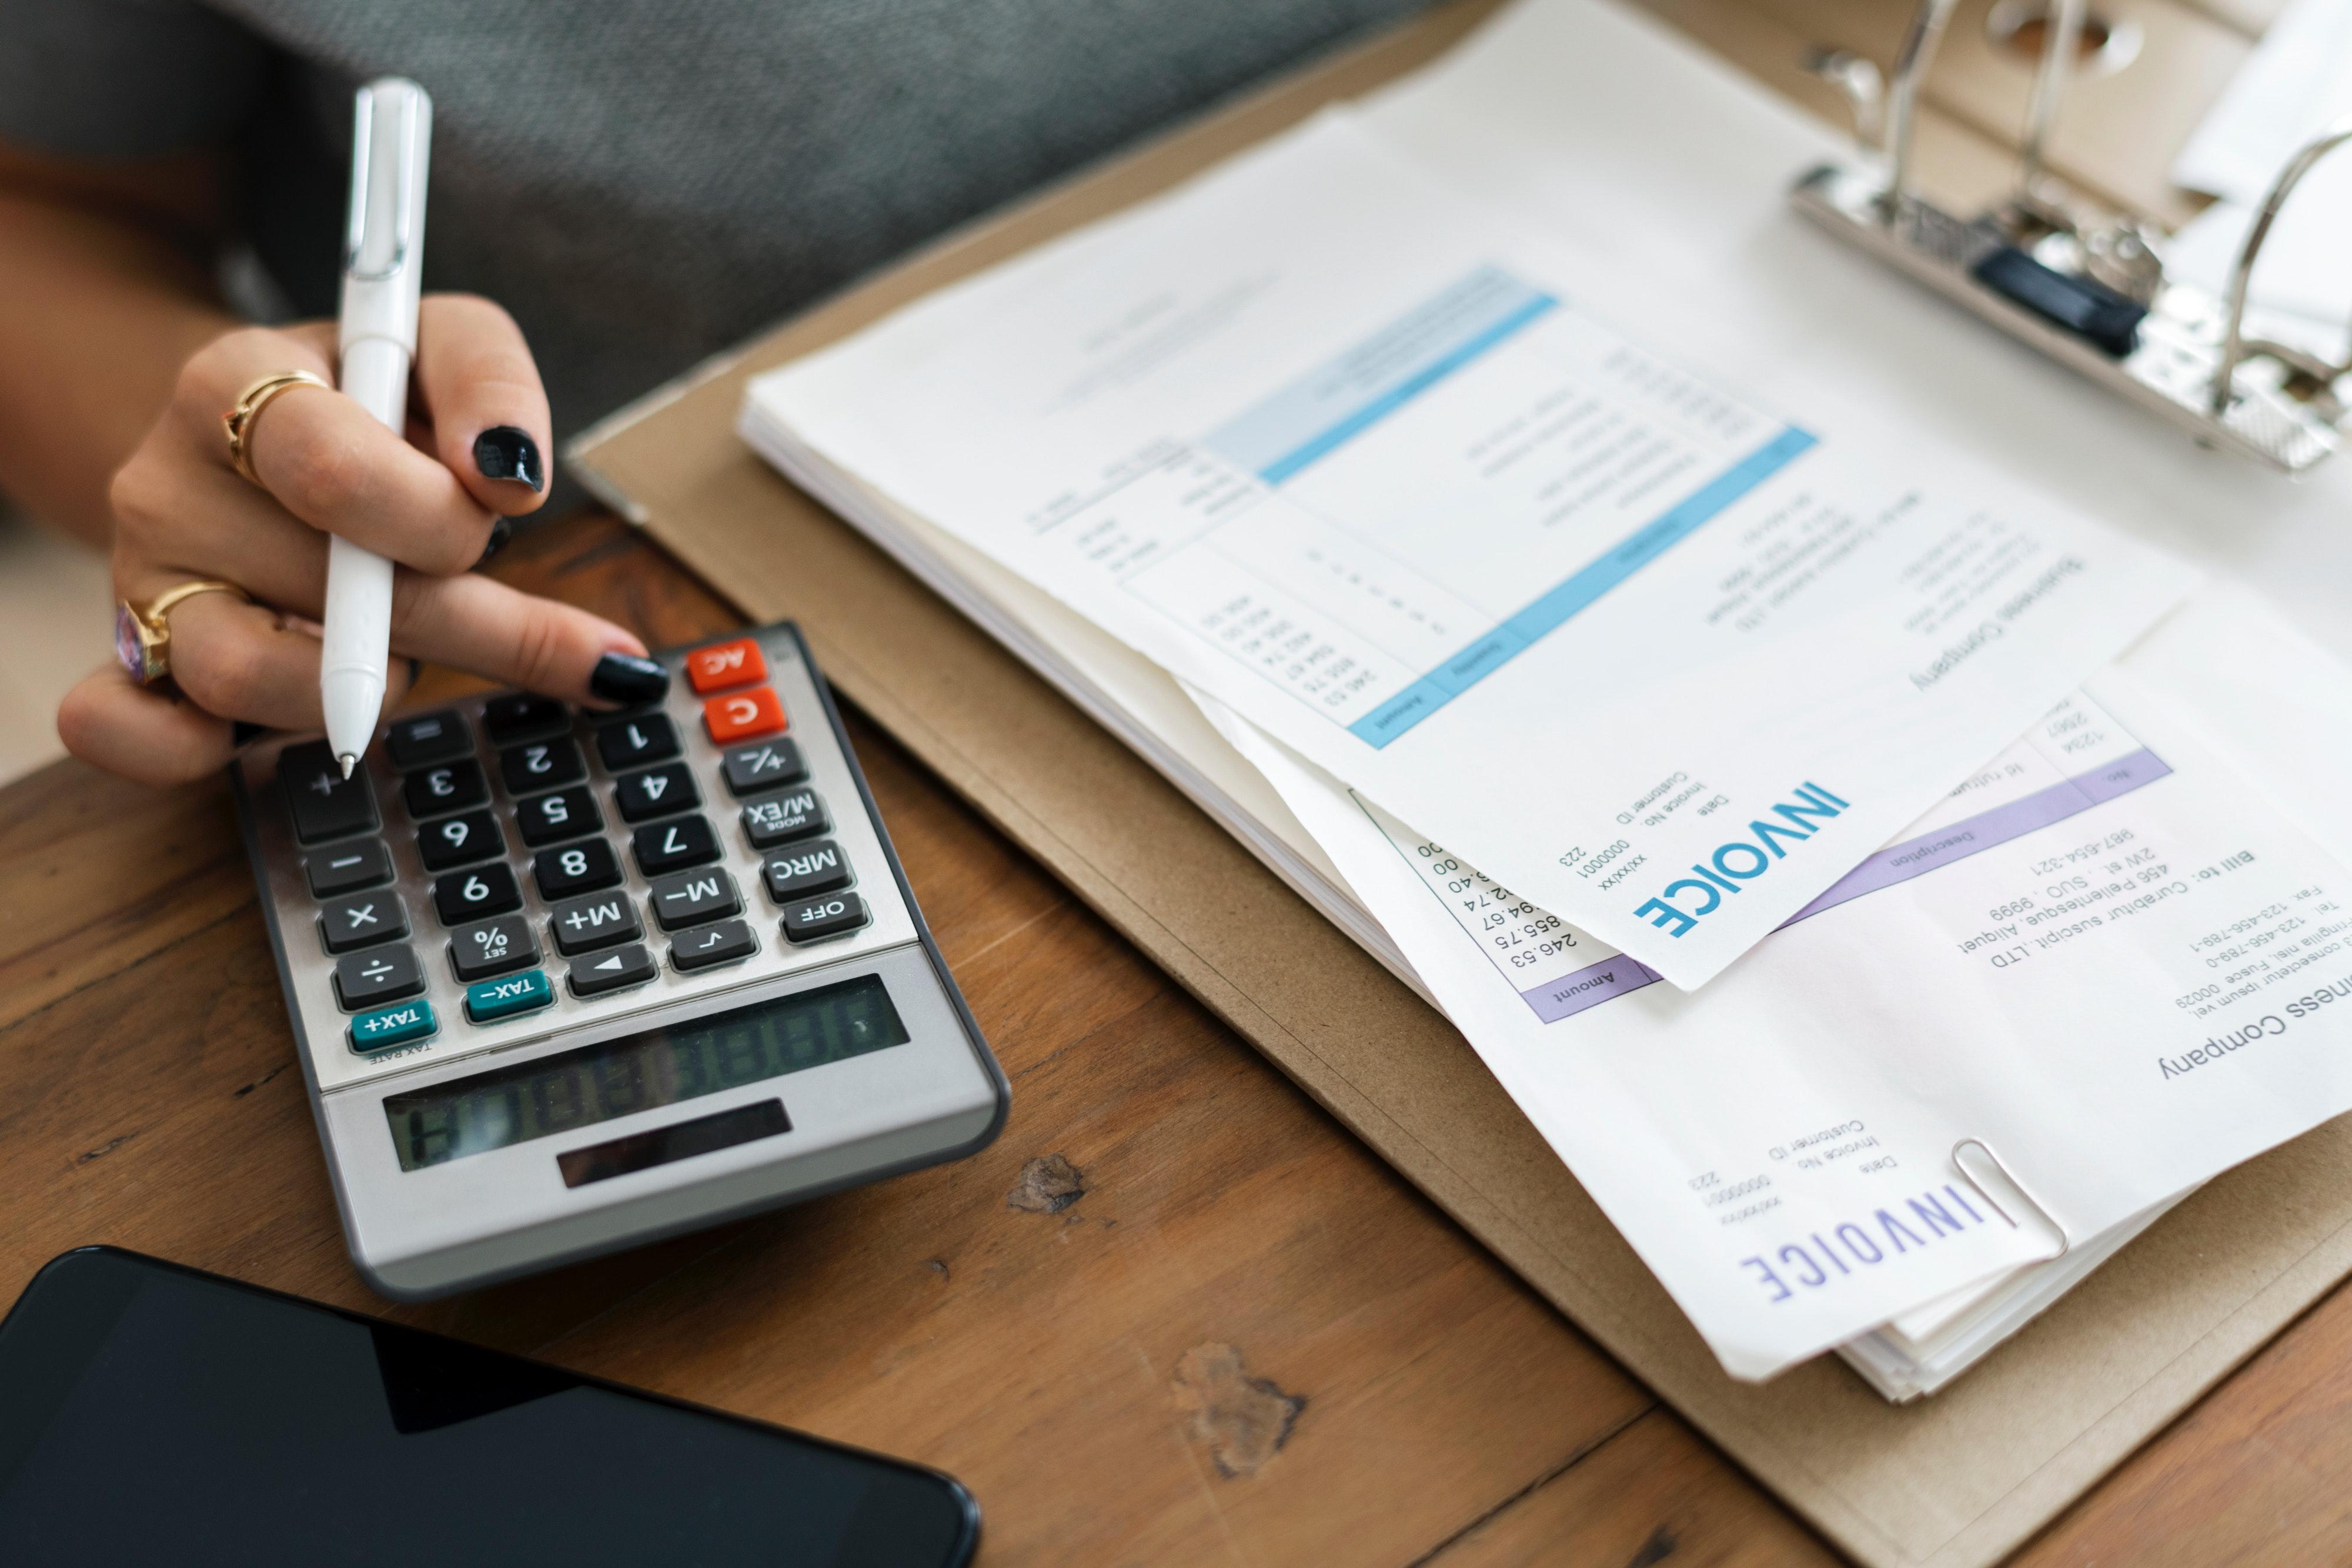 Free Images : alone, bills, calculator, desk, finance ...